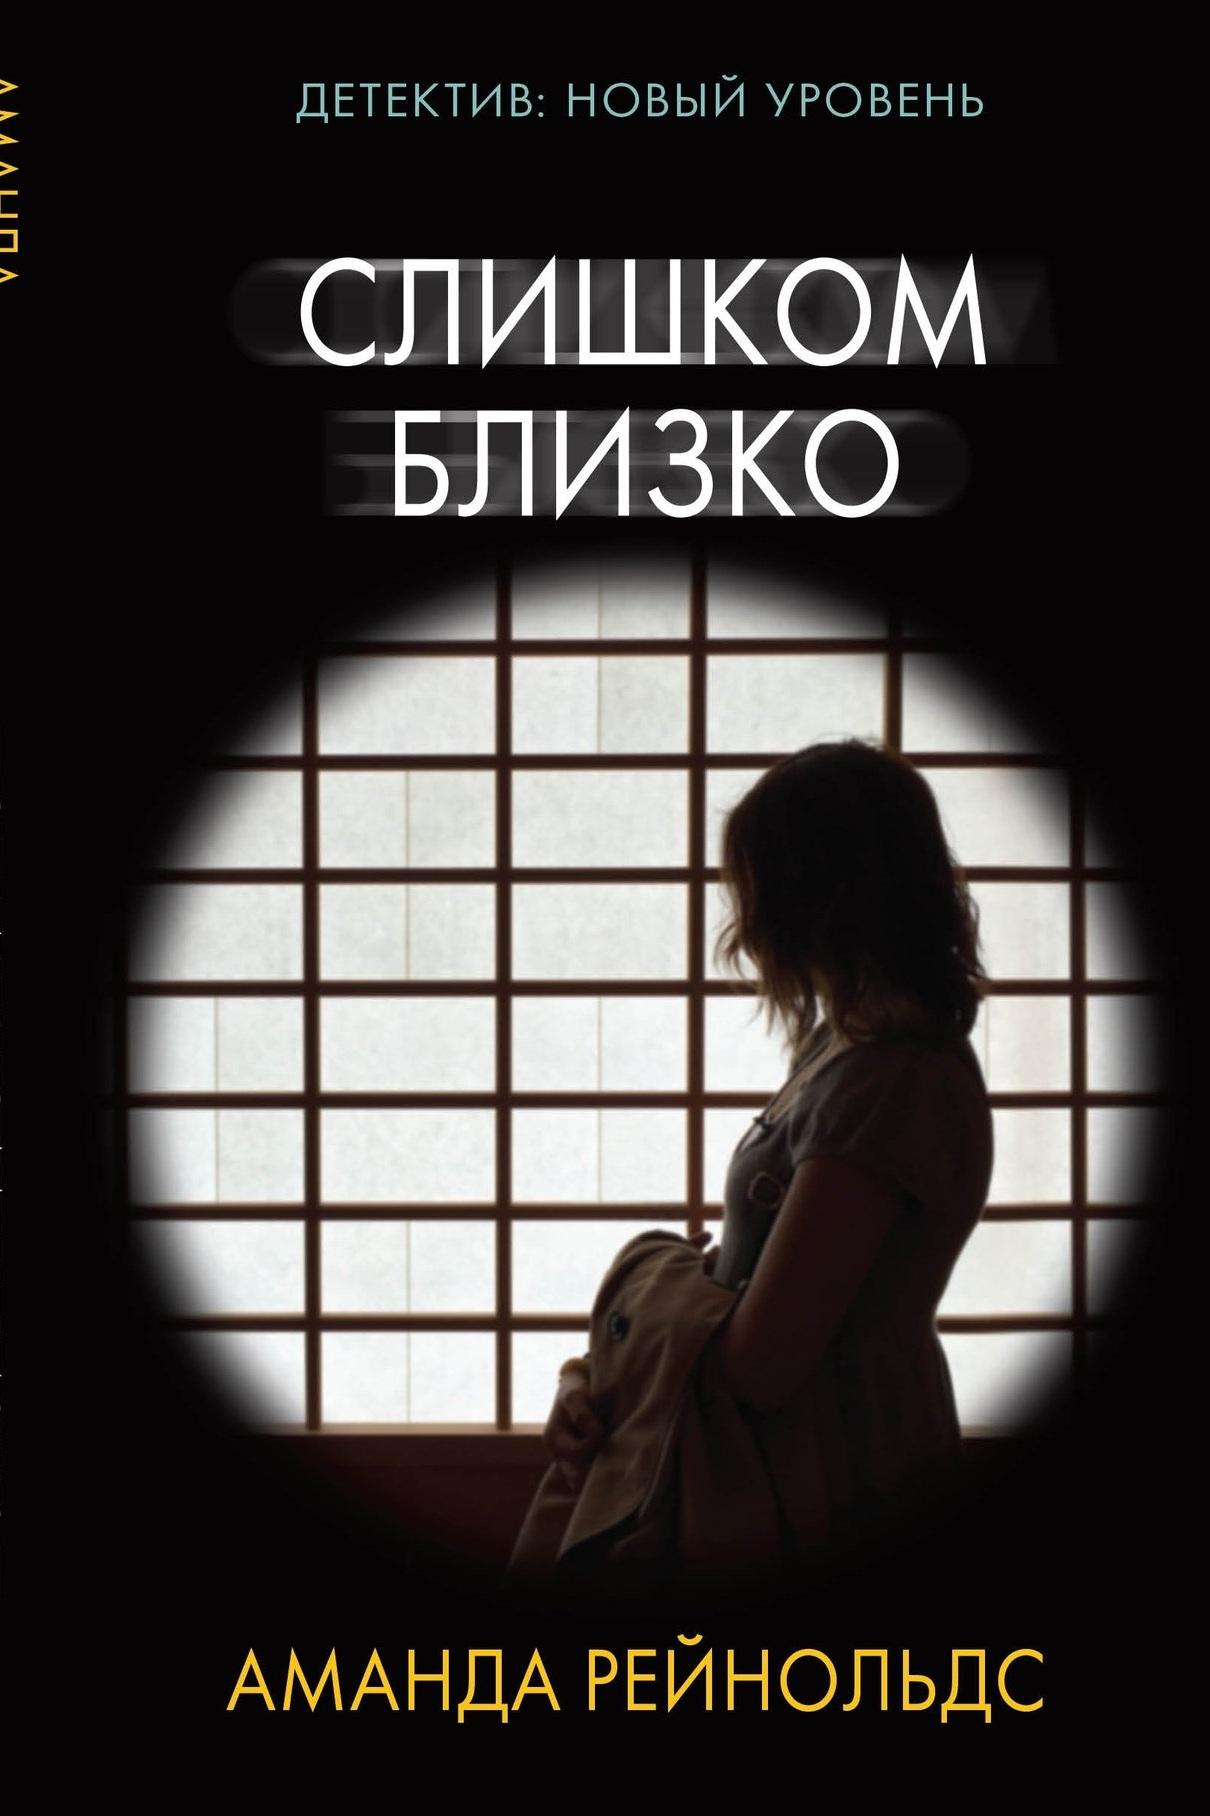 Russia - AST - Too Close (Close To Me) -